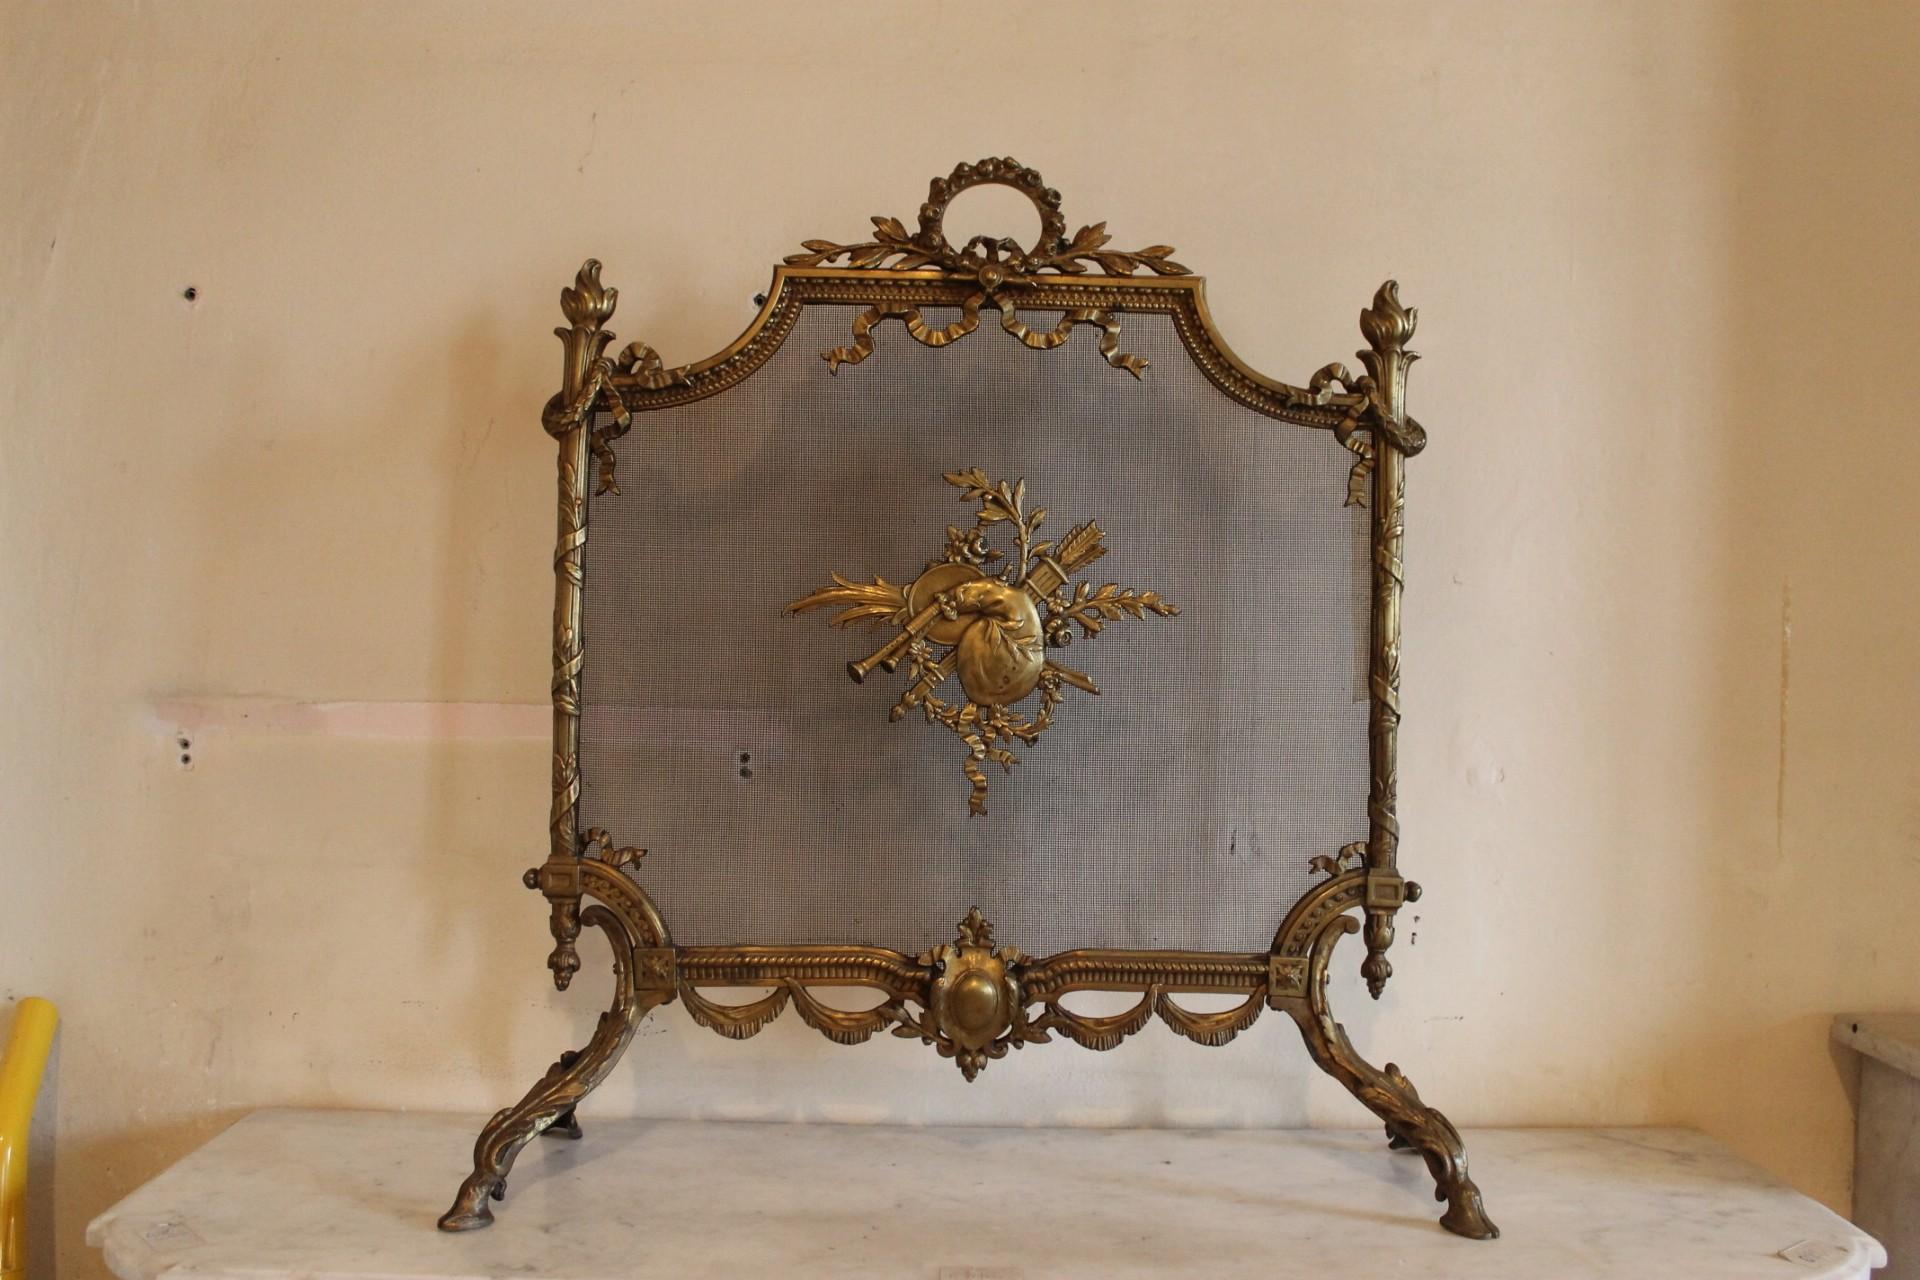 047 PARASCINTILLE NAPOLEONE III PER CAMINETTO LUIGI XVI